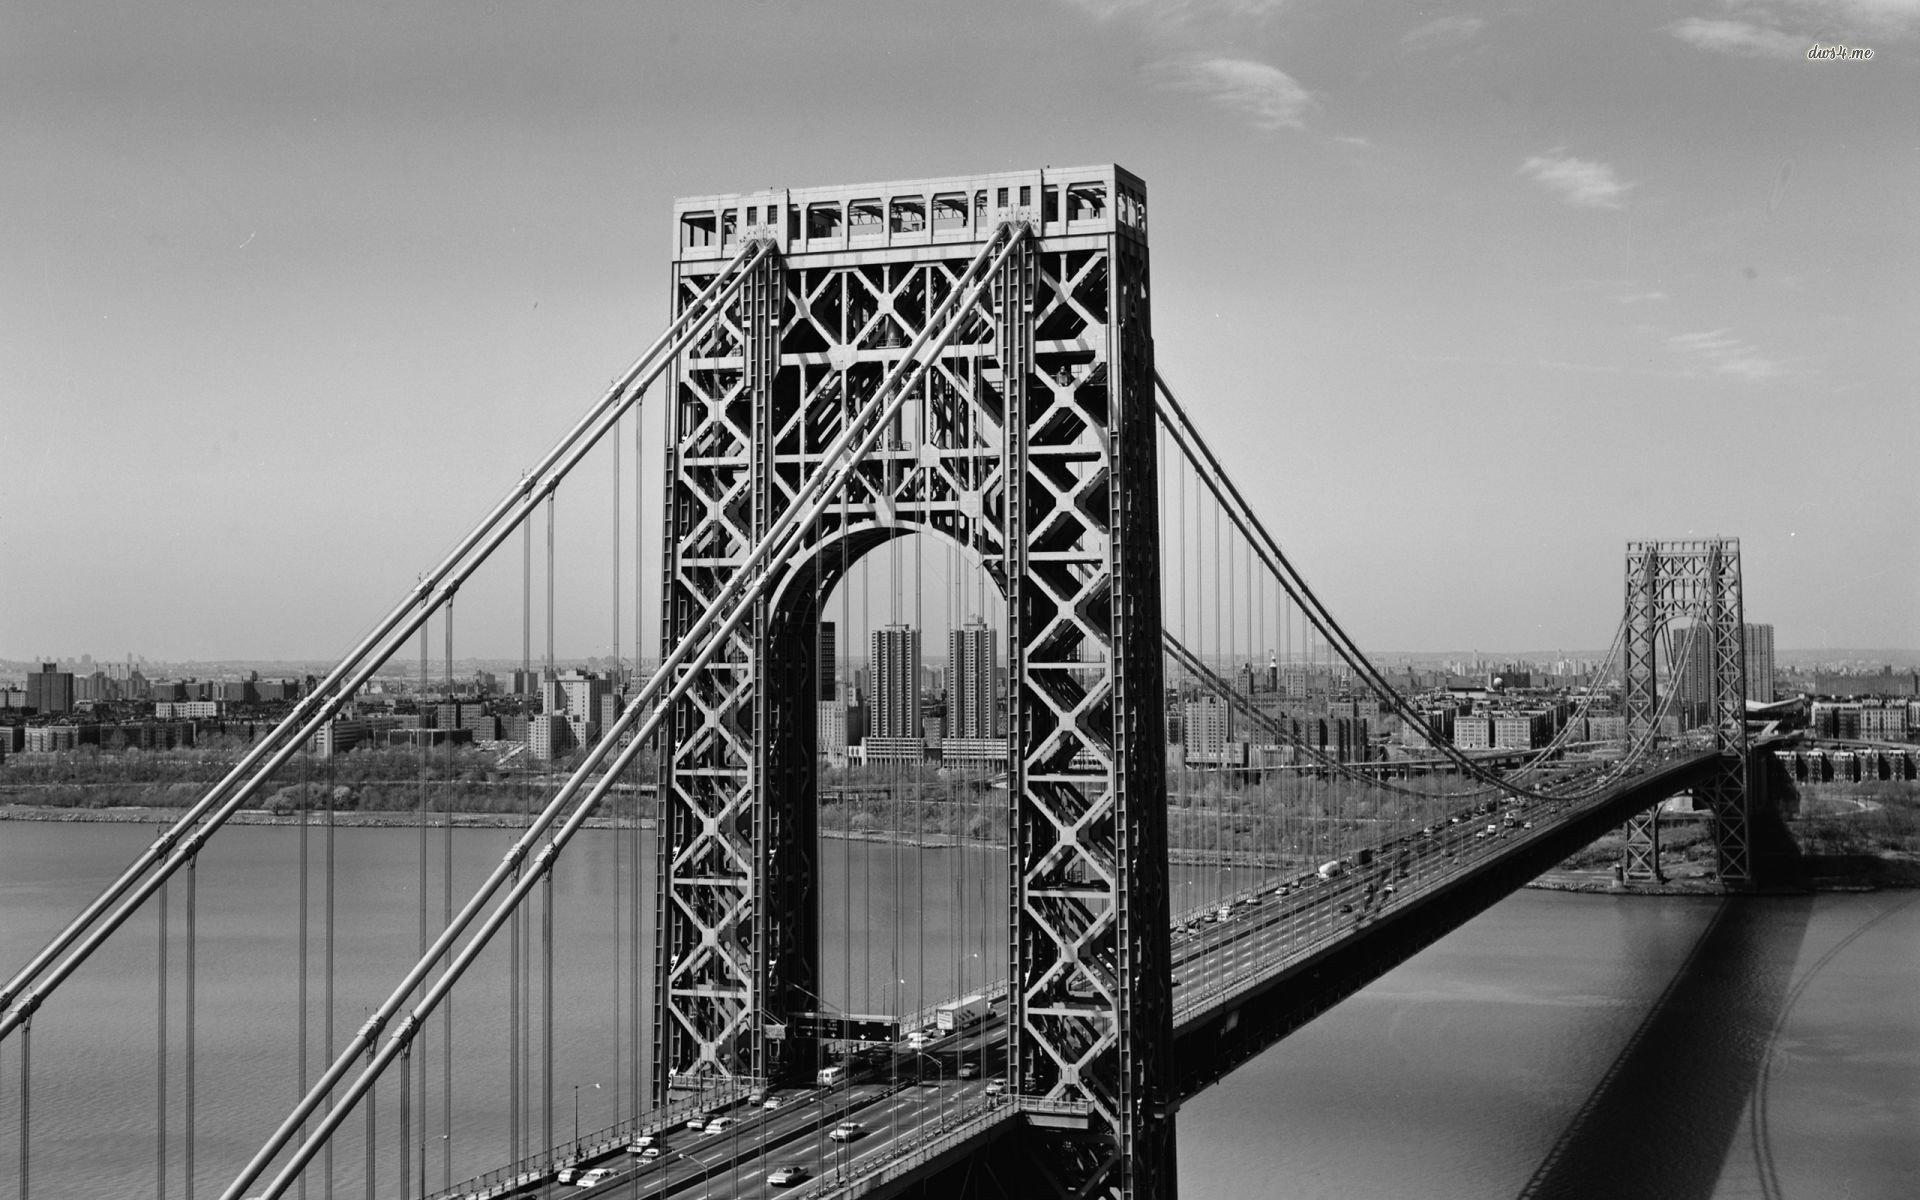 George Washington Bridge Wallpaper 5   1920 X 1200 stmednet 1920x1200